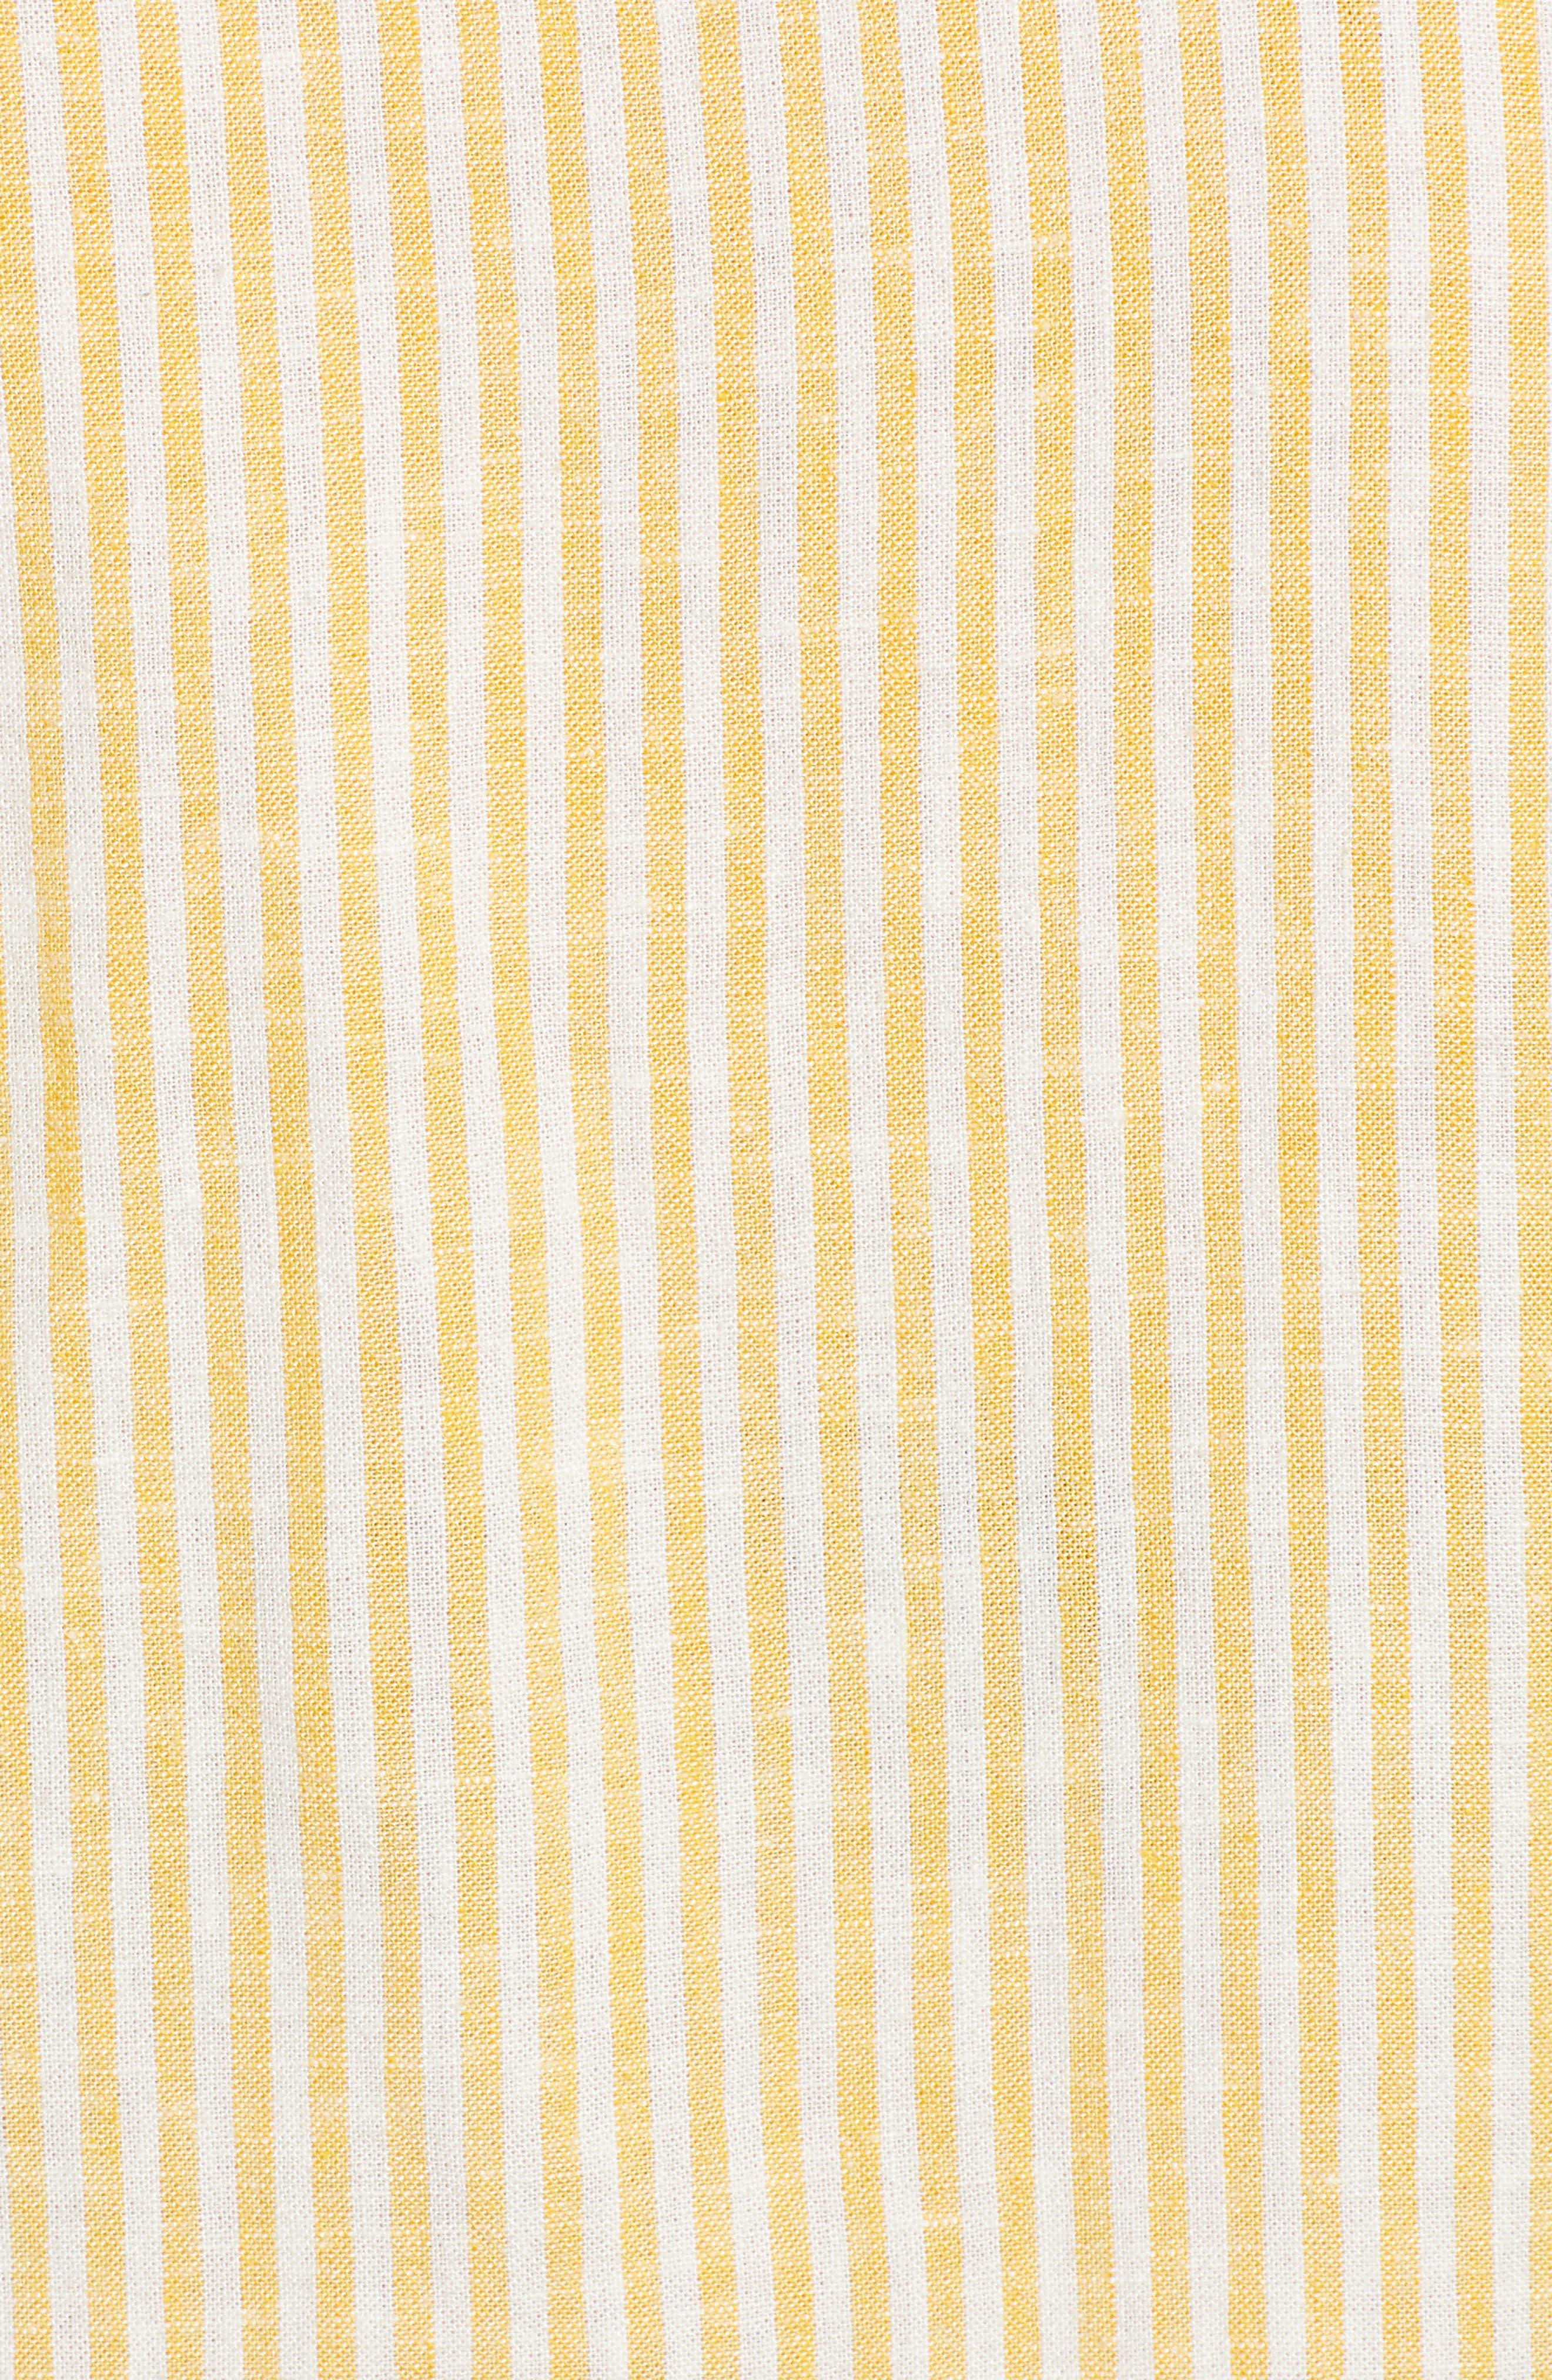 BP.,                             Button Front Linen Blend Top,                             Alternate thumbnail 6, color,                             YELLOW WHIP MARA STRIPE